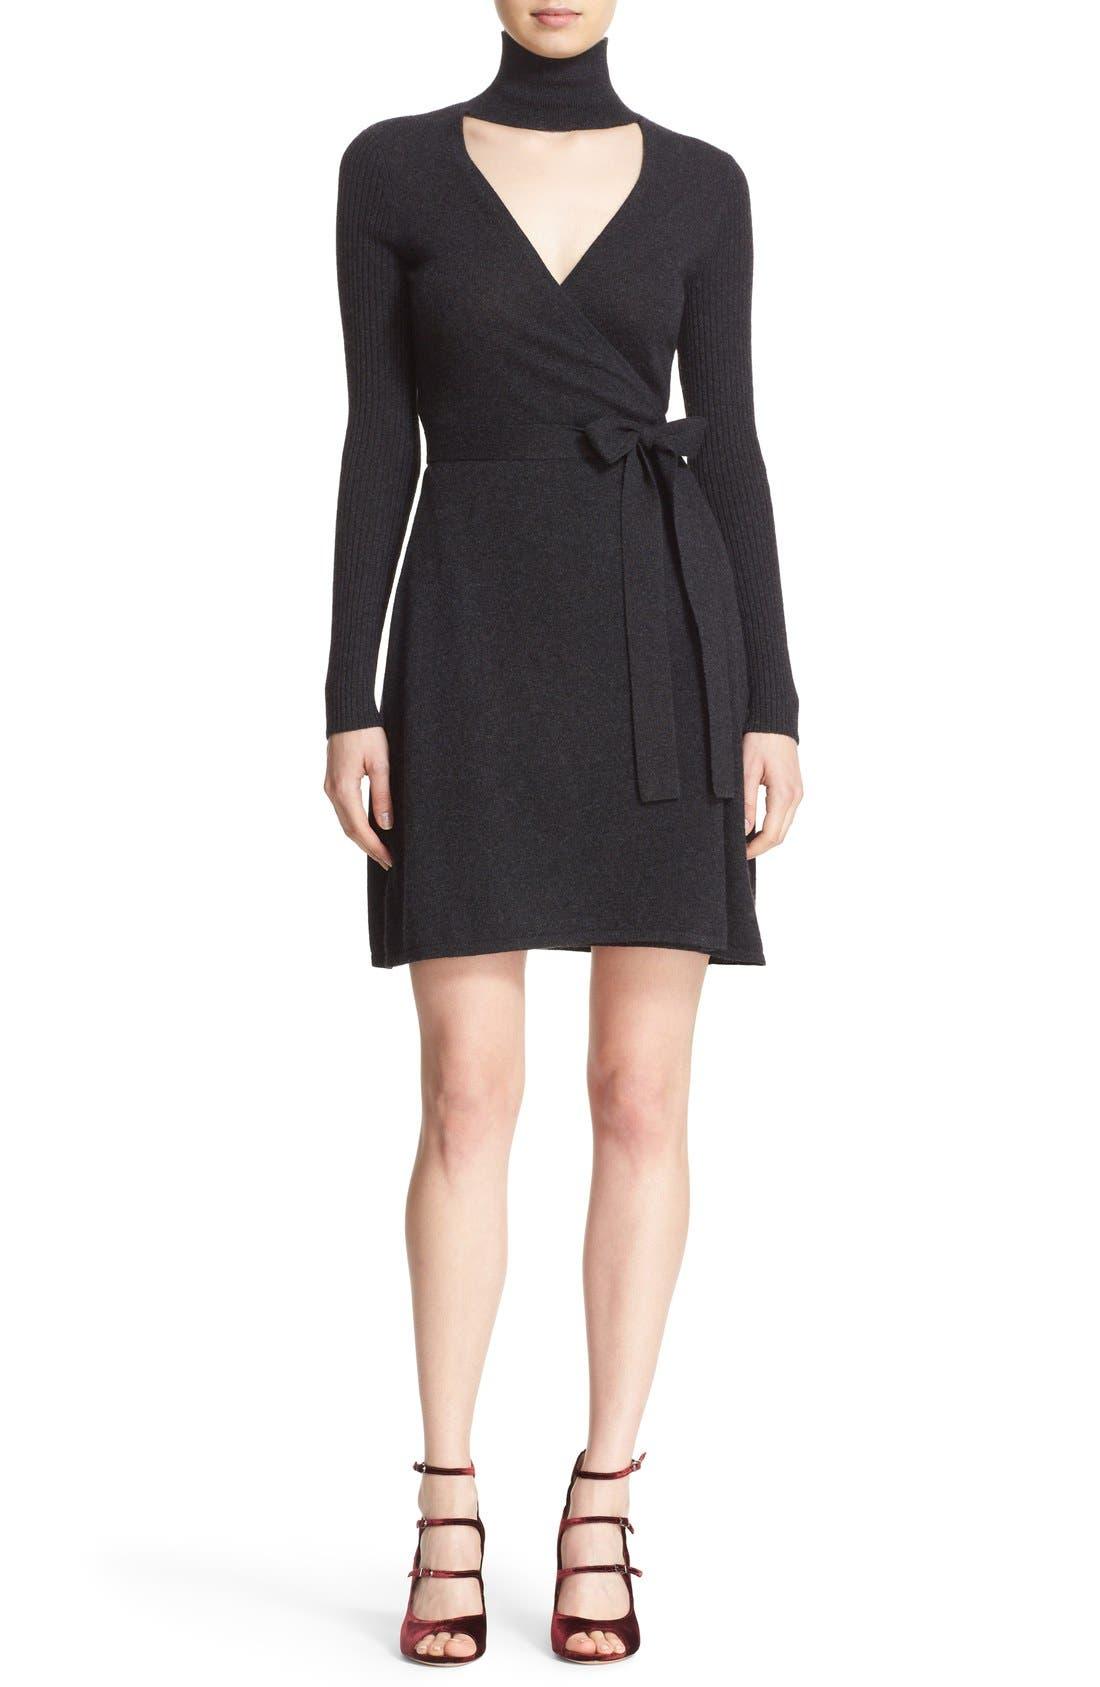 Alternate Image 1 Selected - Diane von Furstenberg 'Janeva' Wool & Cashmere Wrap Dress